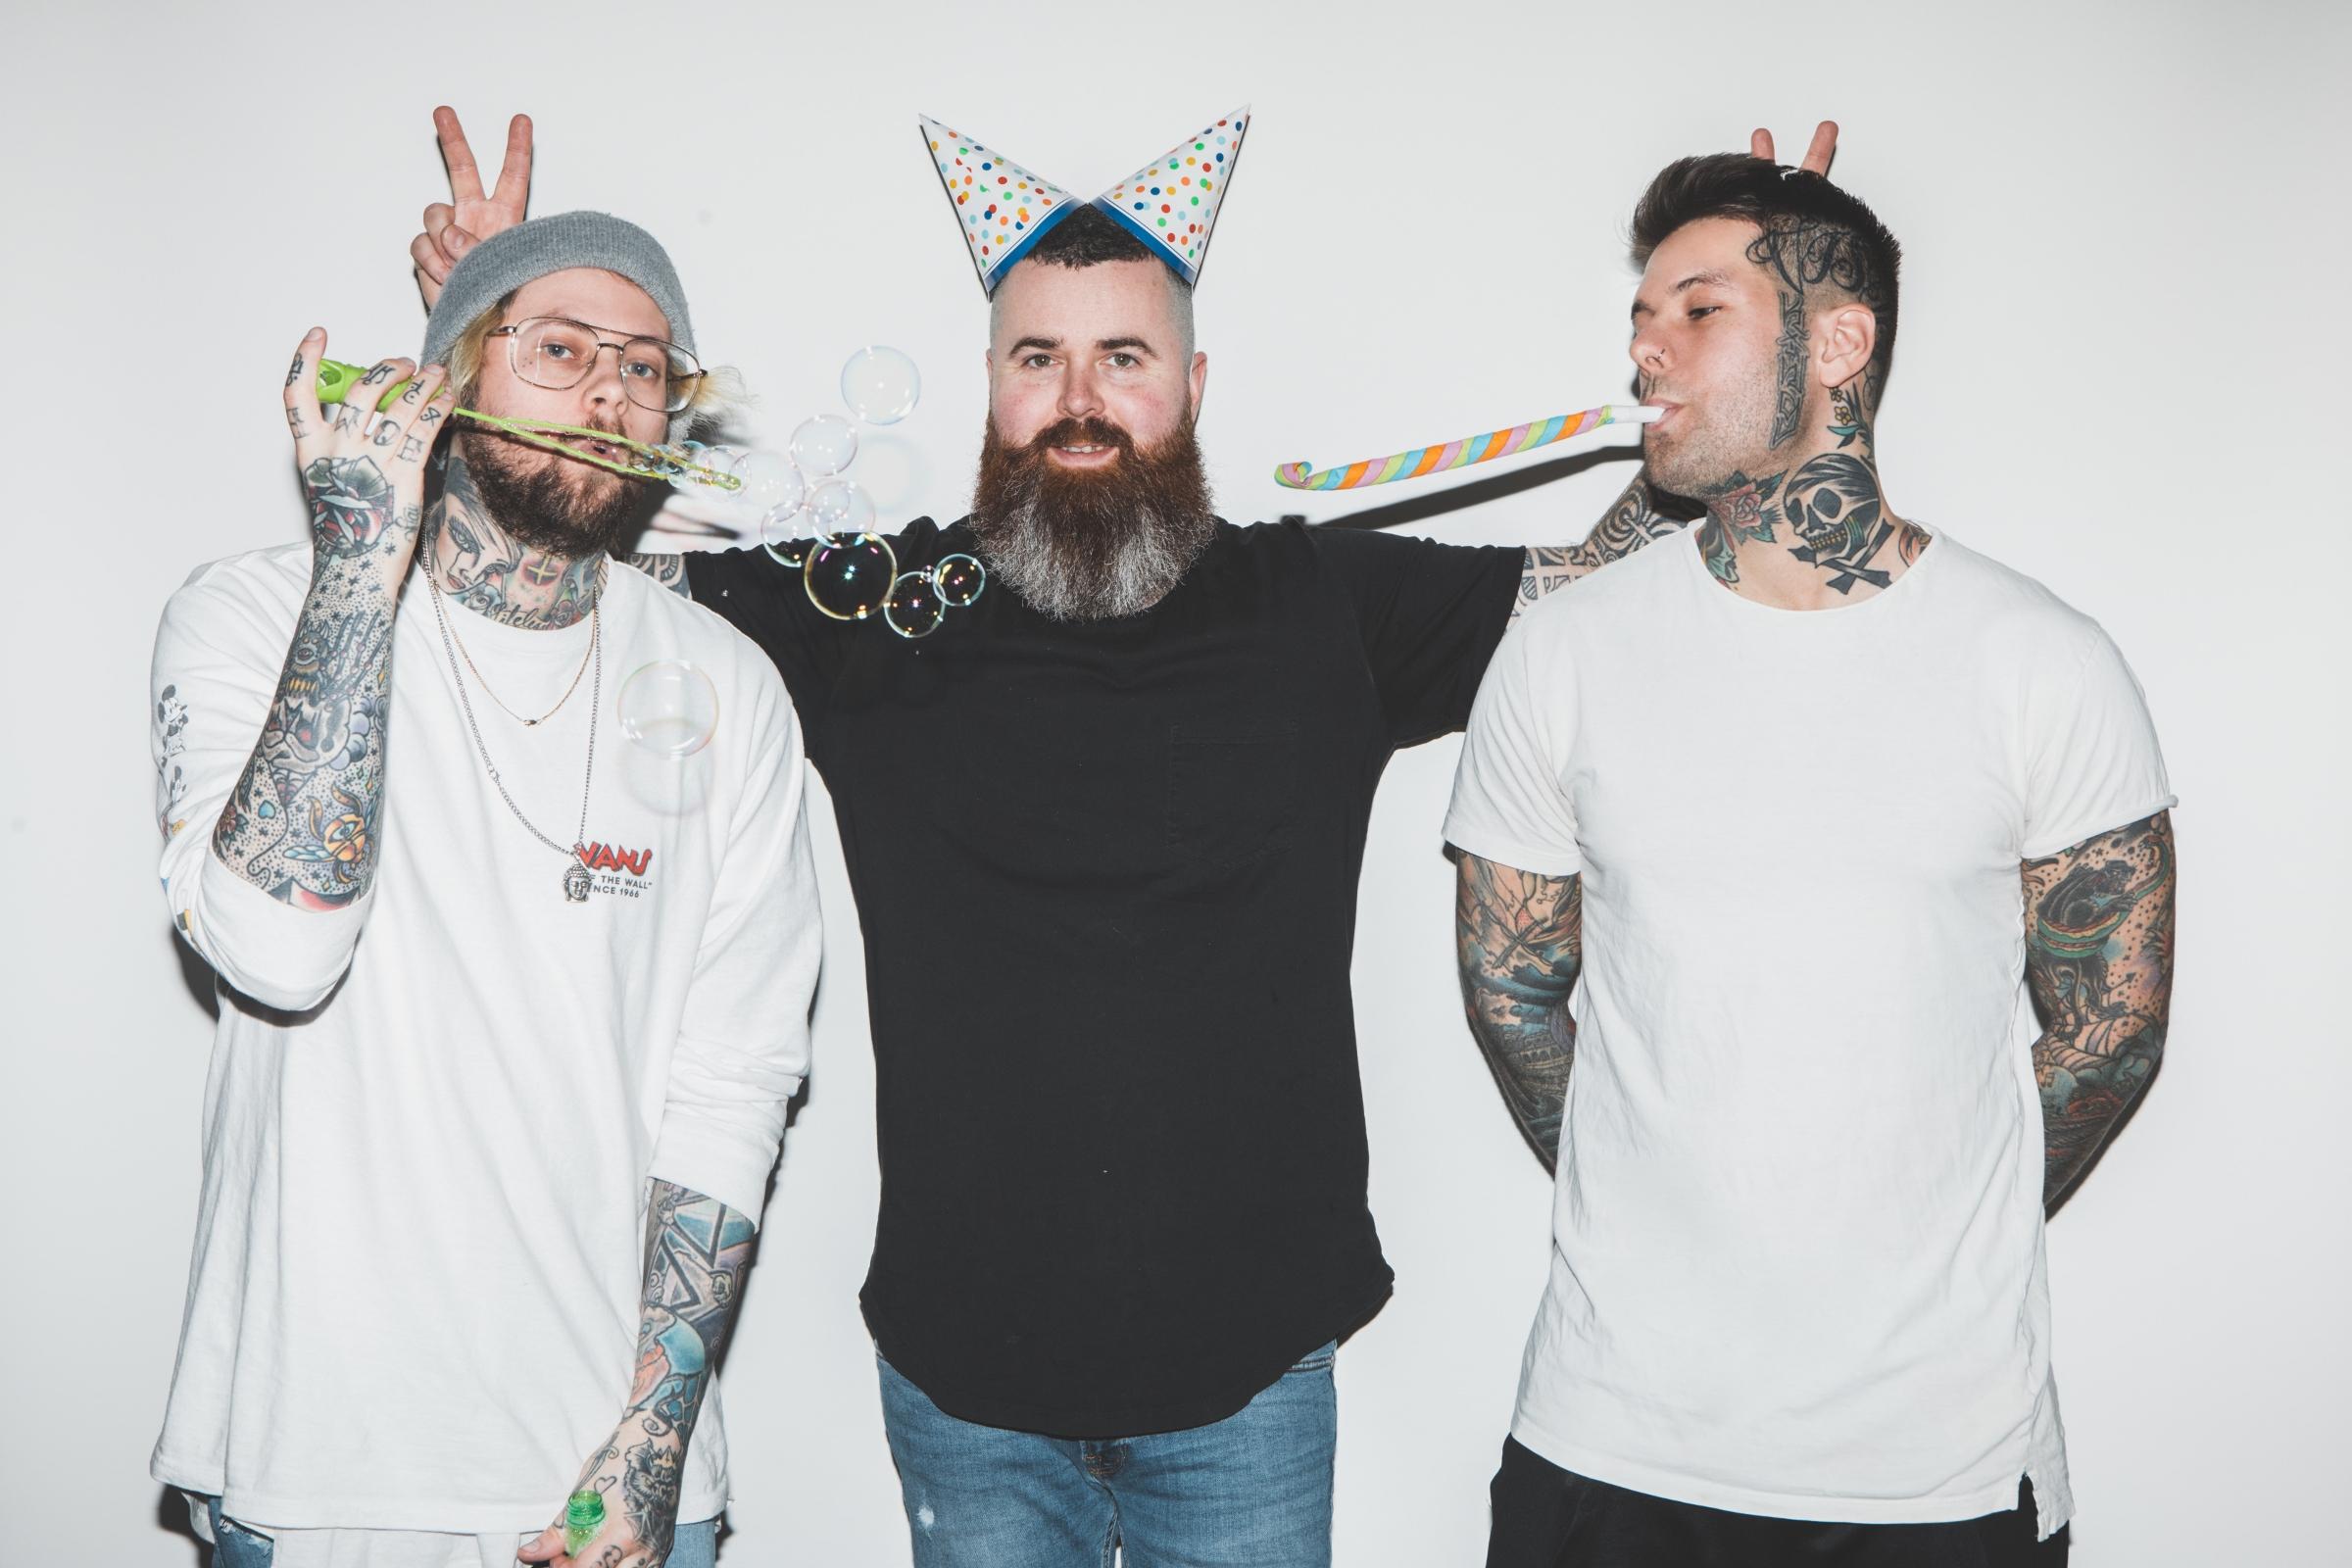 Young Party's shortpants punk show kicks off '77 Montreal